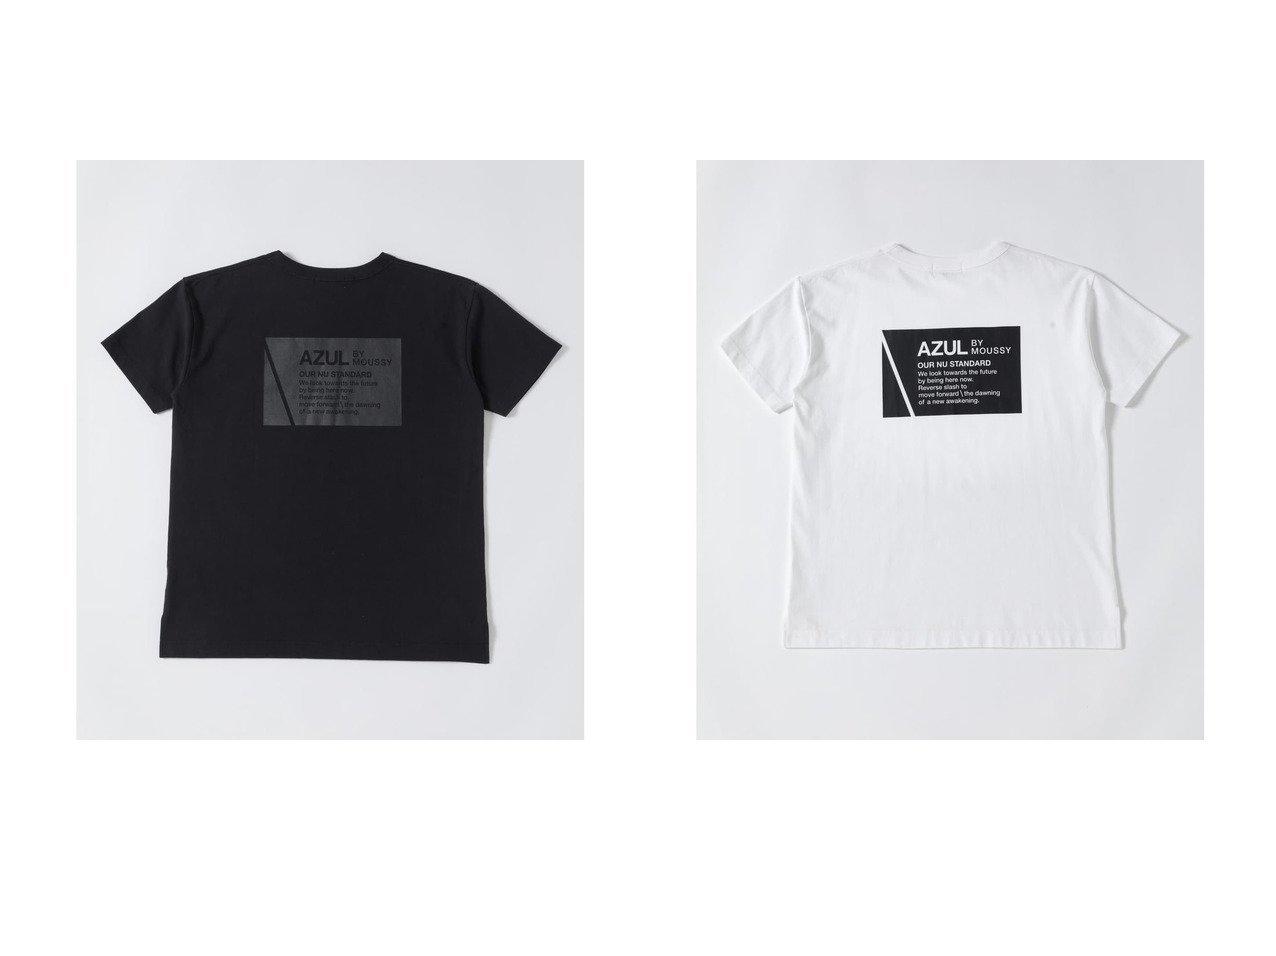 【AZUL by moussy/アズール バイ マウジー】のSHELTECH BACK PRINT TEE 【プチプライス・低価格】おすすめ!人気、トレンド・レディースファッションの通販 おすすめで人気の流行・トレンド、ファッションの通販商品 インテリア・家具・メンズファッション・キッズファッション・レディースファッション・服の通販 founy(ファニー) https://founy.com/ ファッション Fashion レディースファッション WOMEN 2021年 2021 2021春夏・S/S SS/Spring/Summer/2021 S/S・春夏 SS・Spring/Summer バランス プリント 夏 Summer 春 Spring 軽量  ID:crp329100000054149